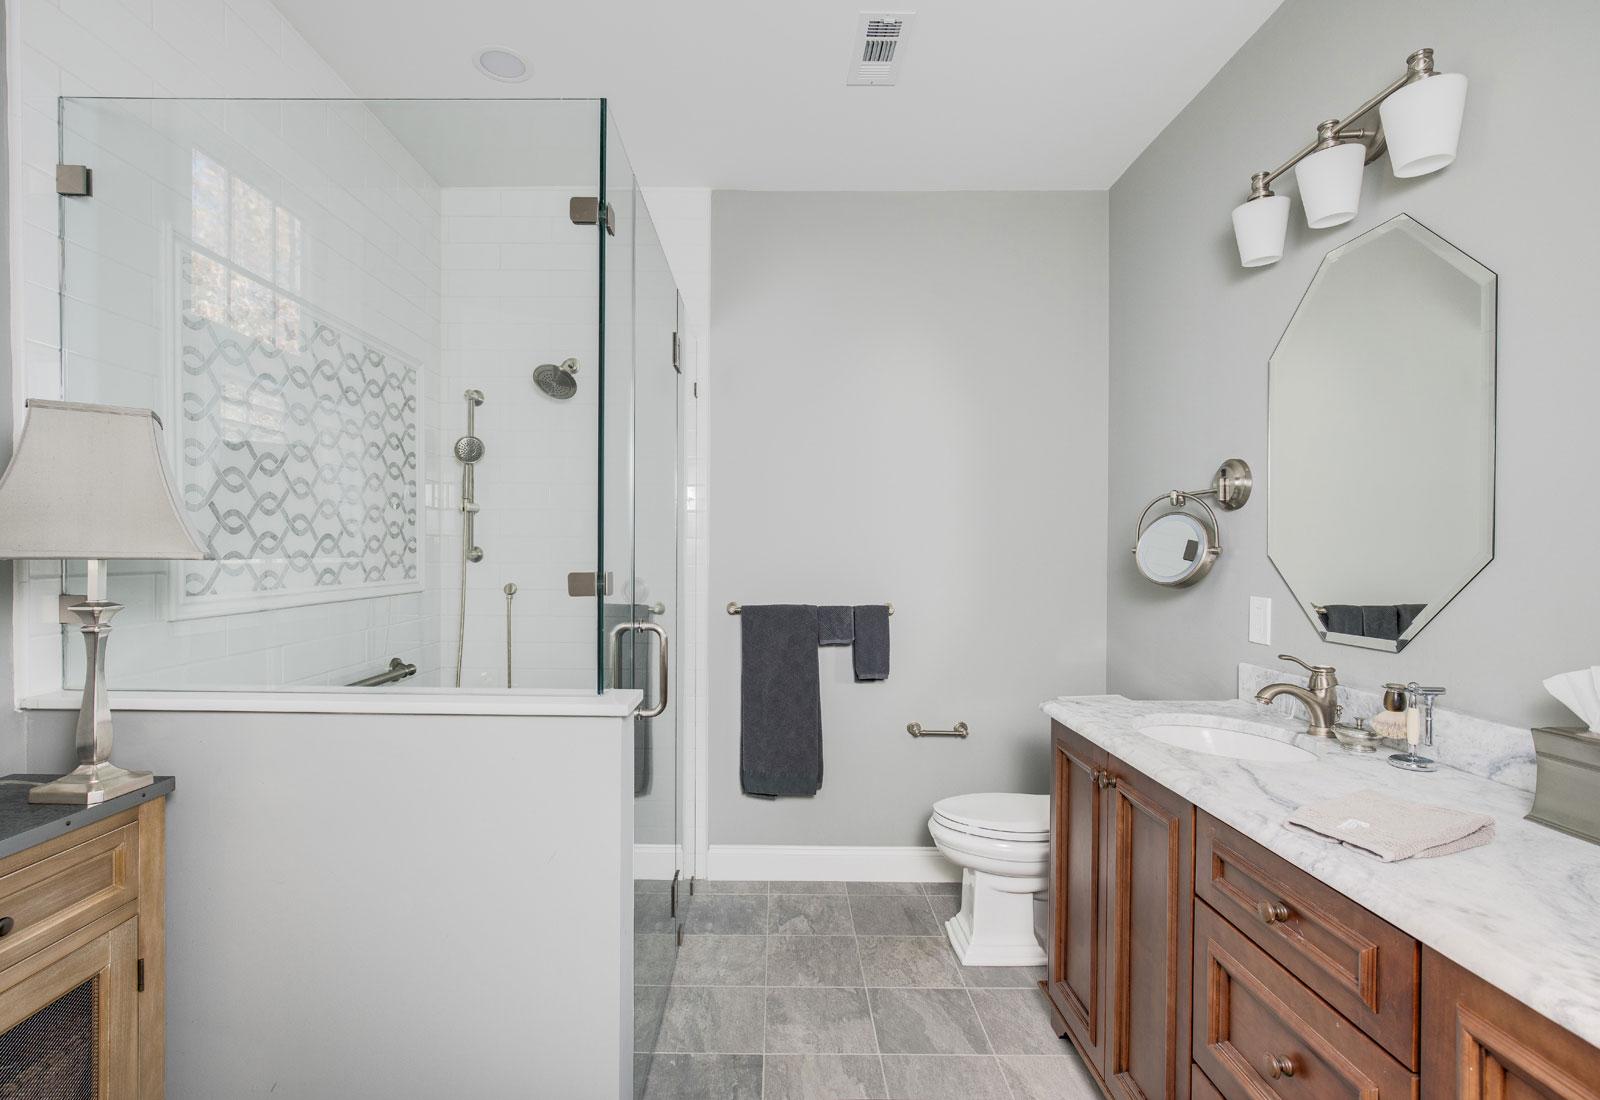 Bathrooms   R. Craig Lord Construction Co.